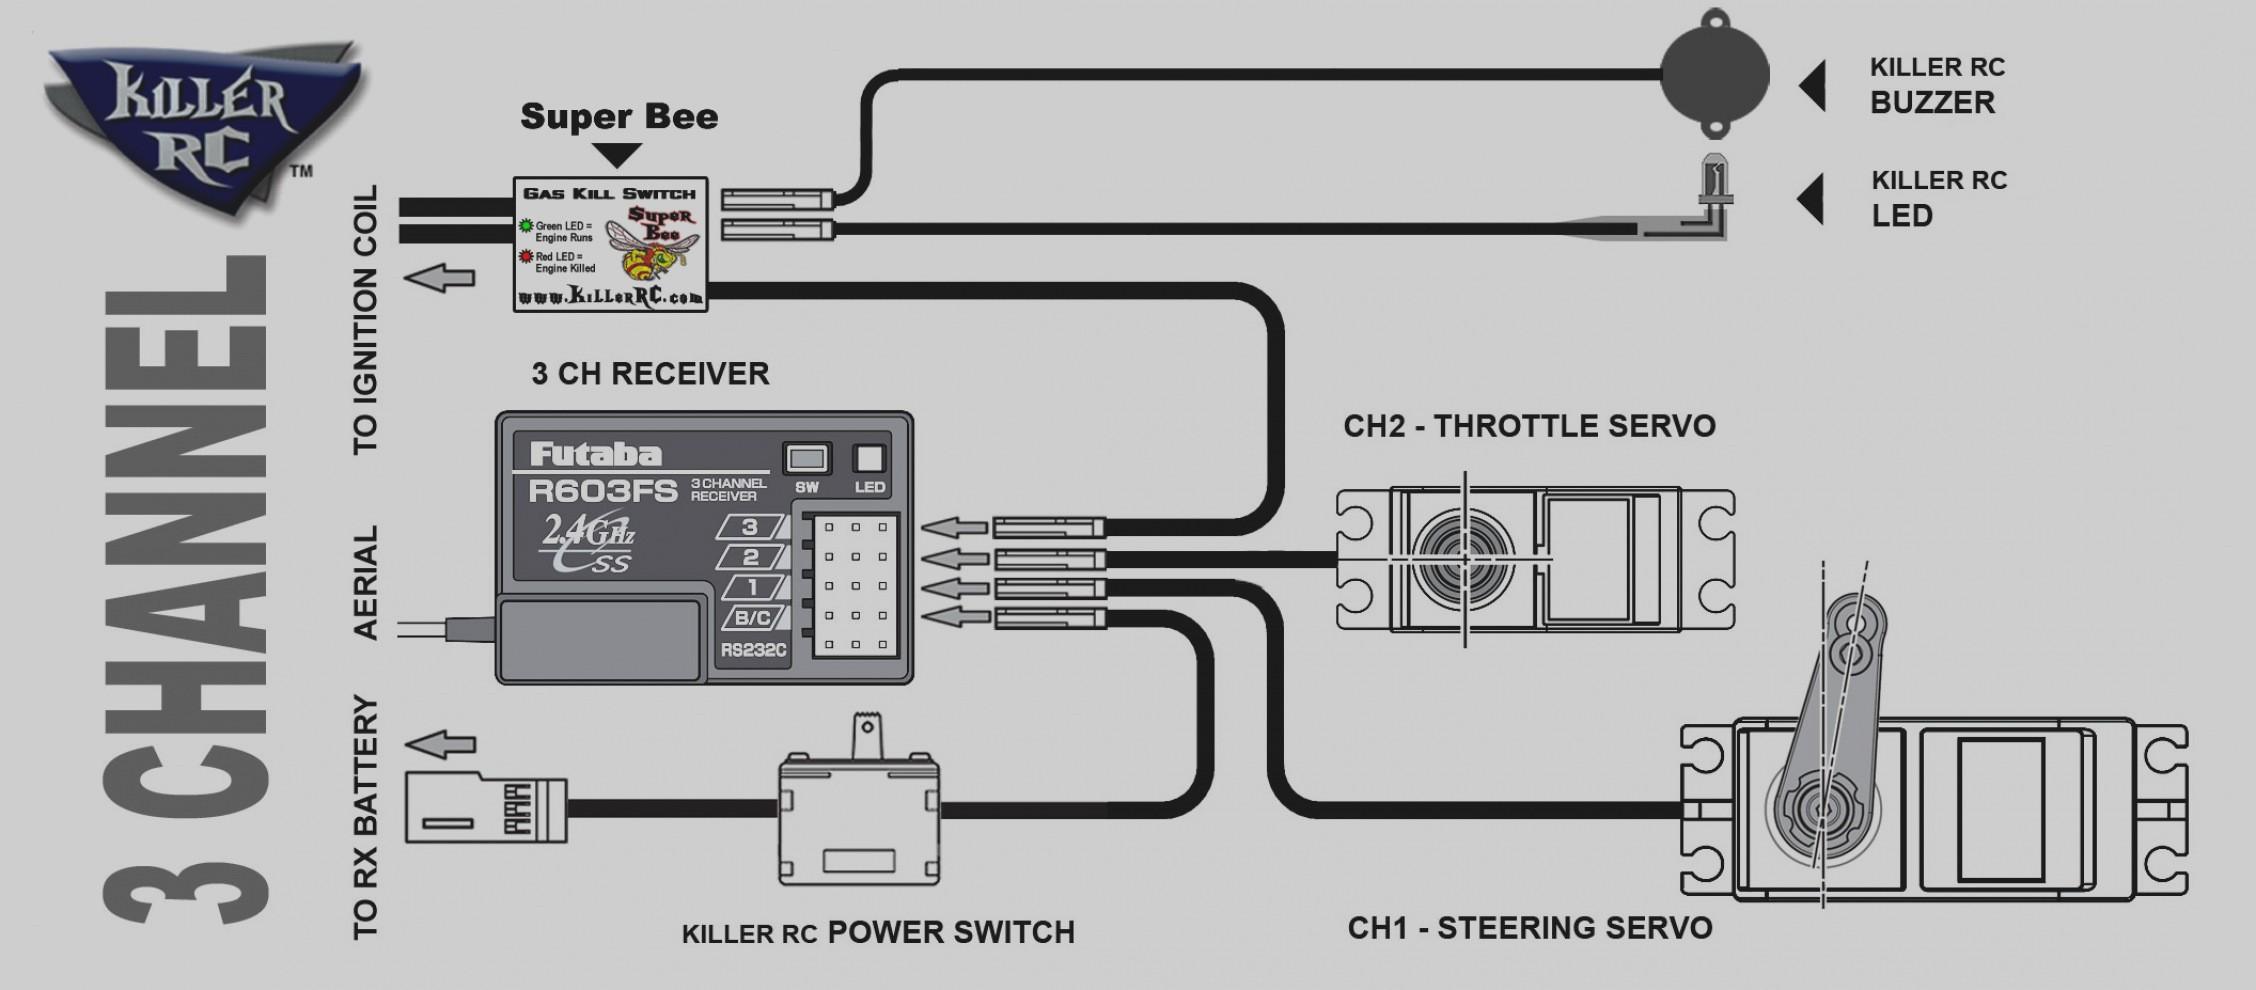 Wiring Diagram for A Guitar Kill Switch New Killswitch Wiring Diagram Guitar Refrence Dorable with Kill